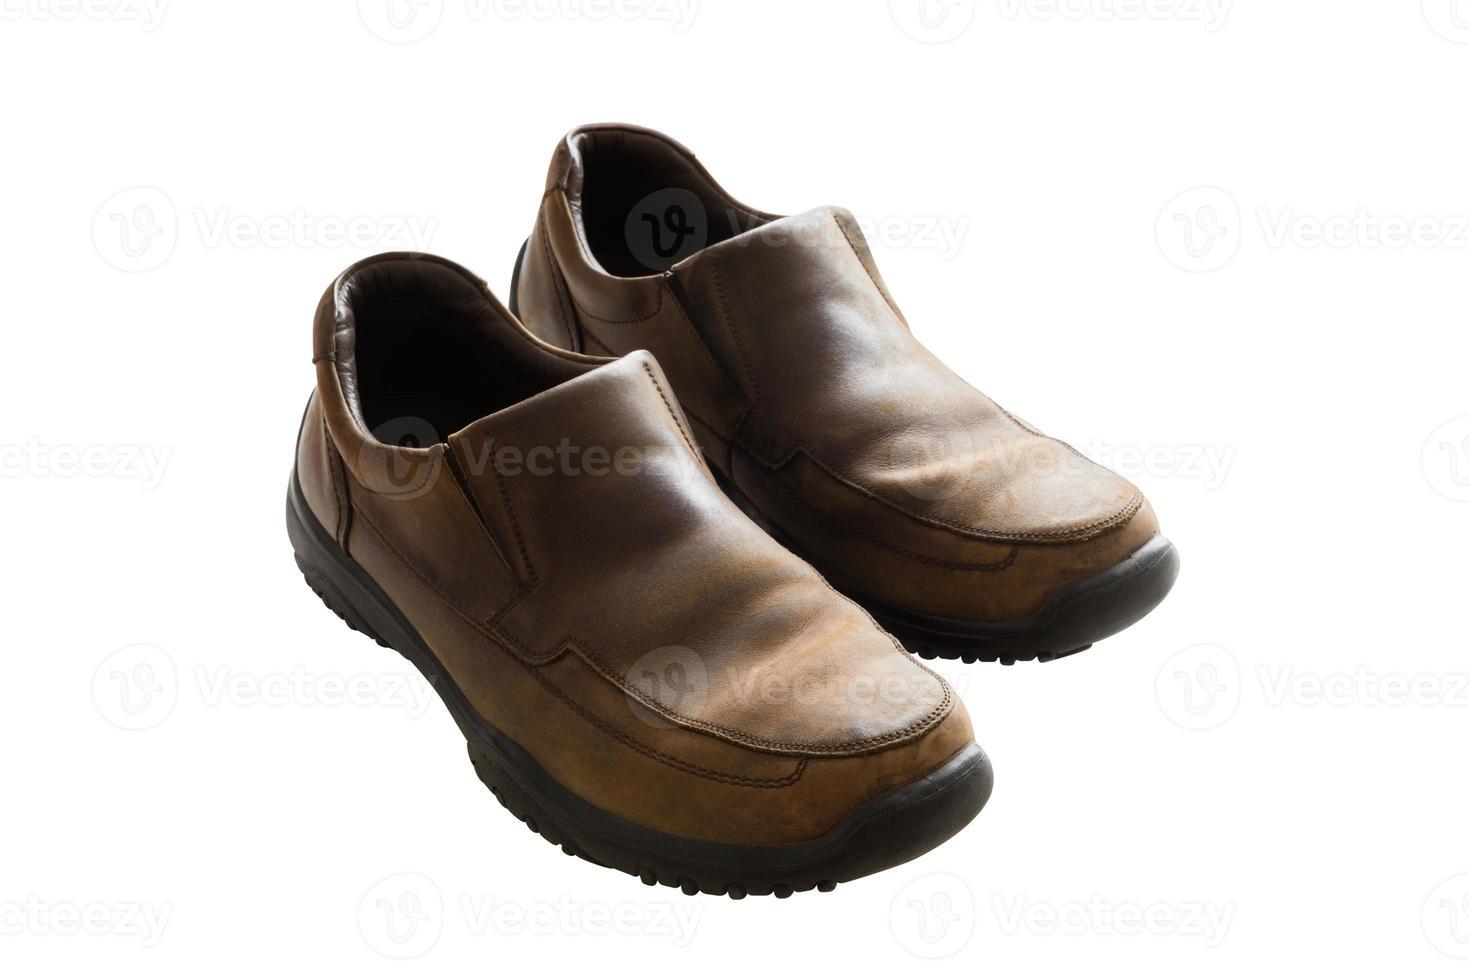 chaussures homme en cuir marron photo